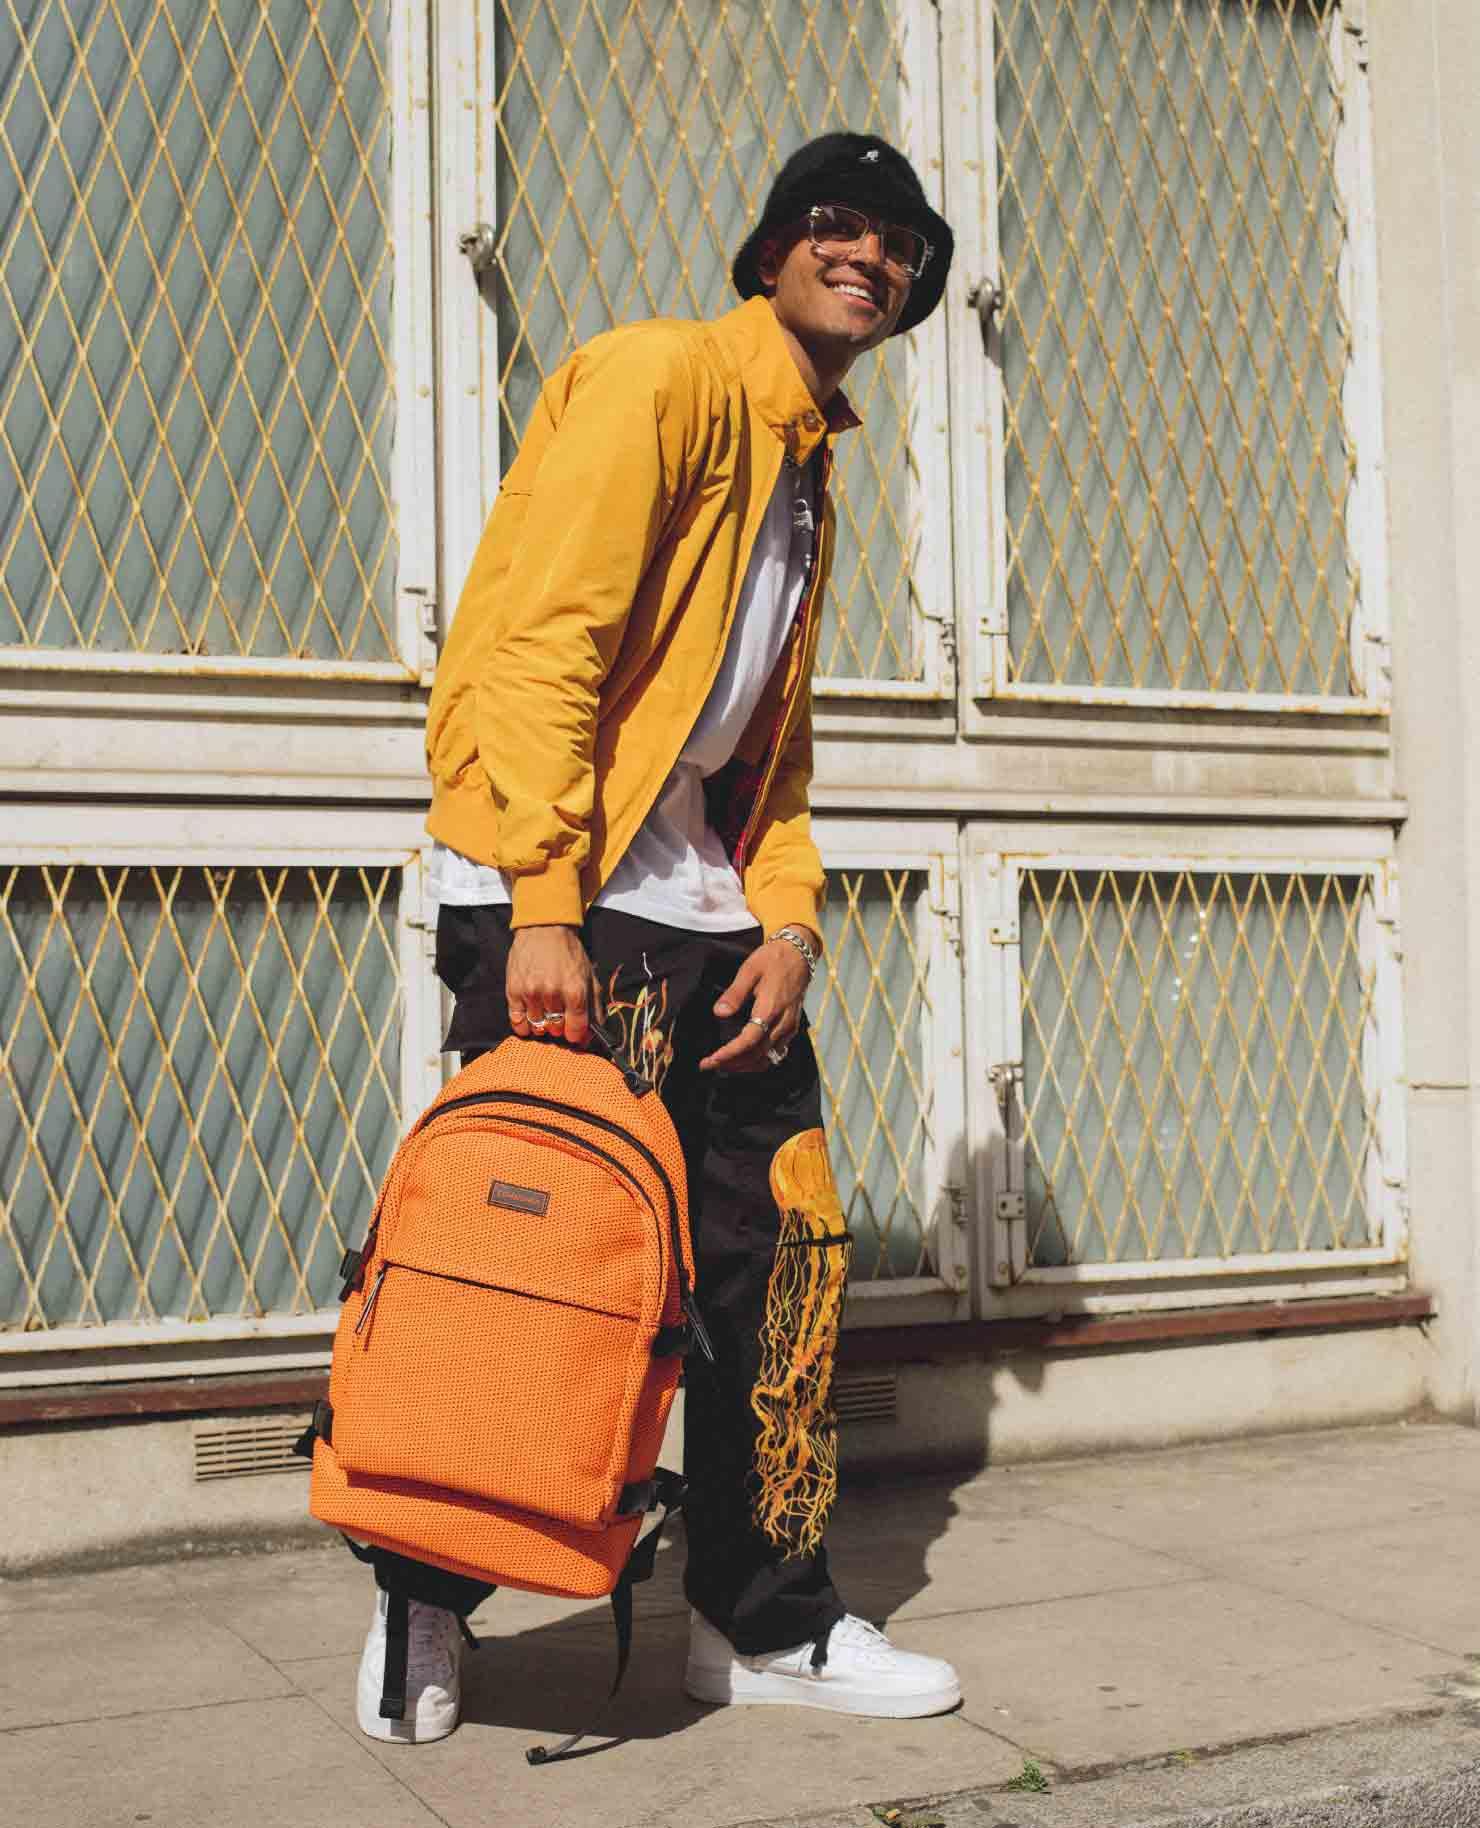 Elias Riadi Modeling The Saint Barton Backpack In Orange